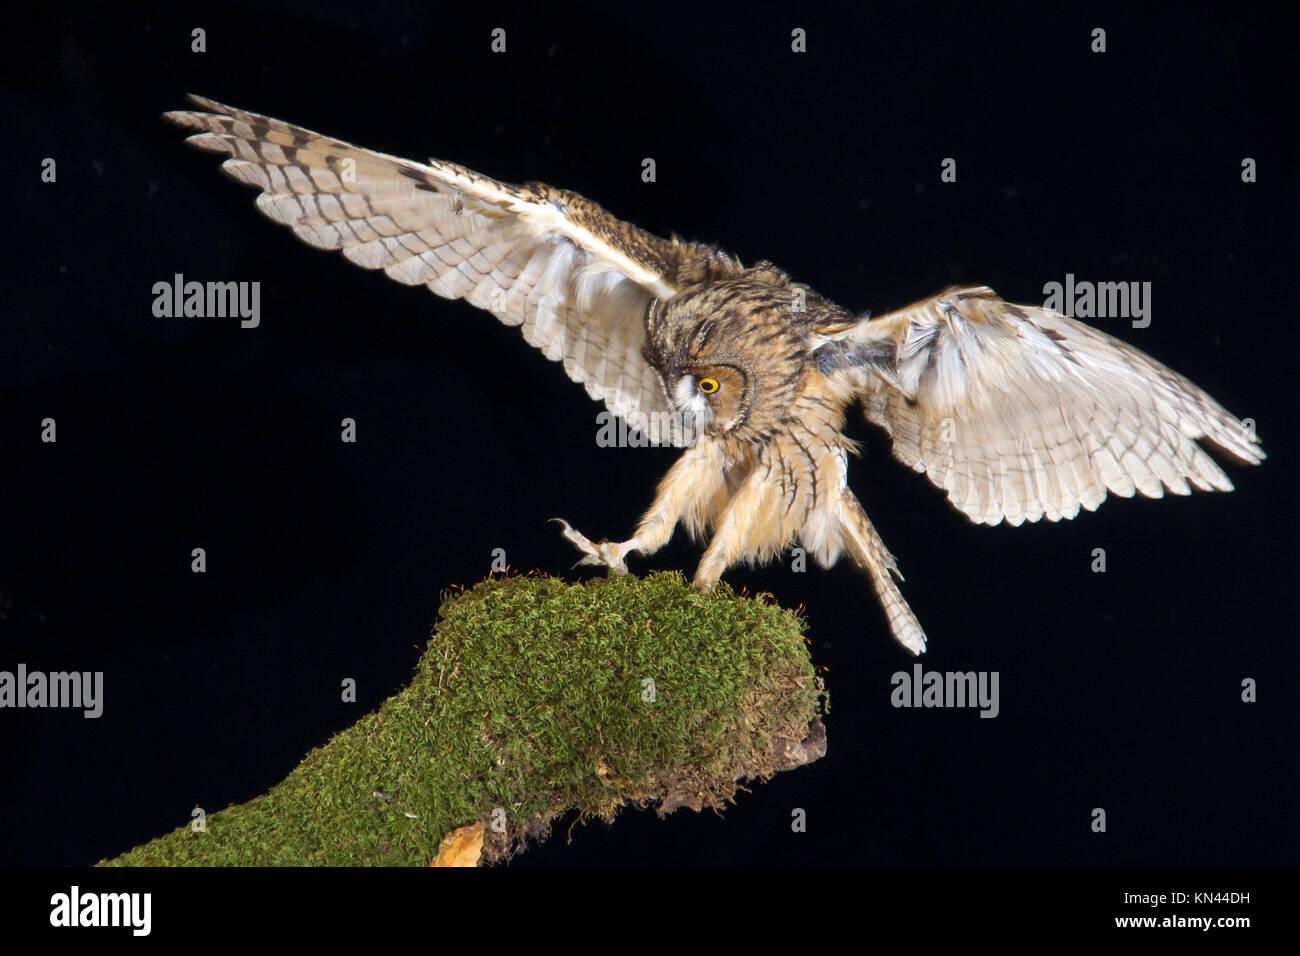 Asio otus, family Strigidae, Malaga, Andalusia, Spain - Stock Image